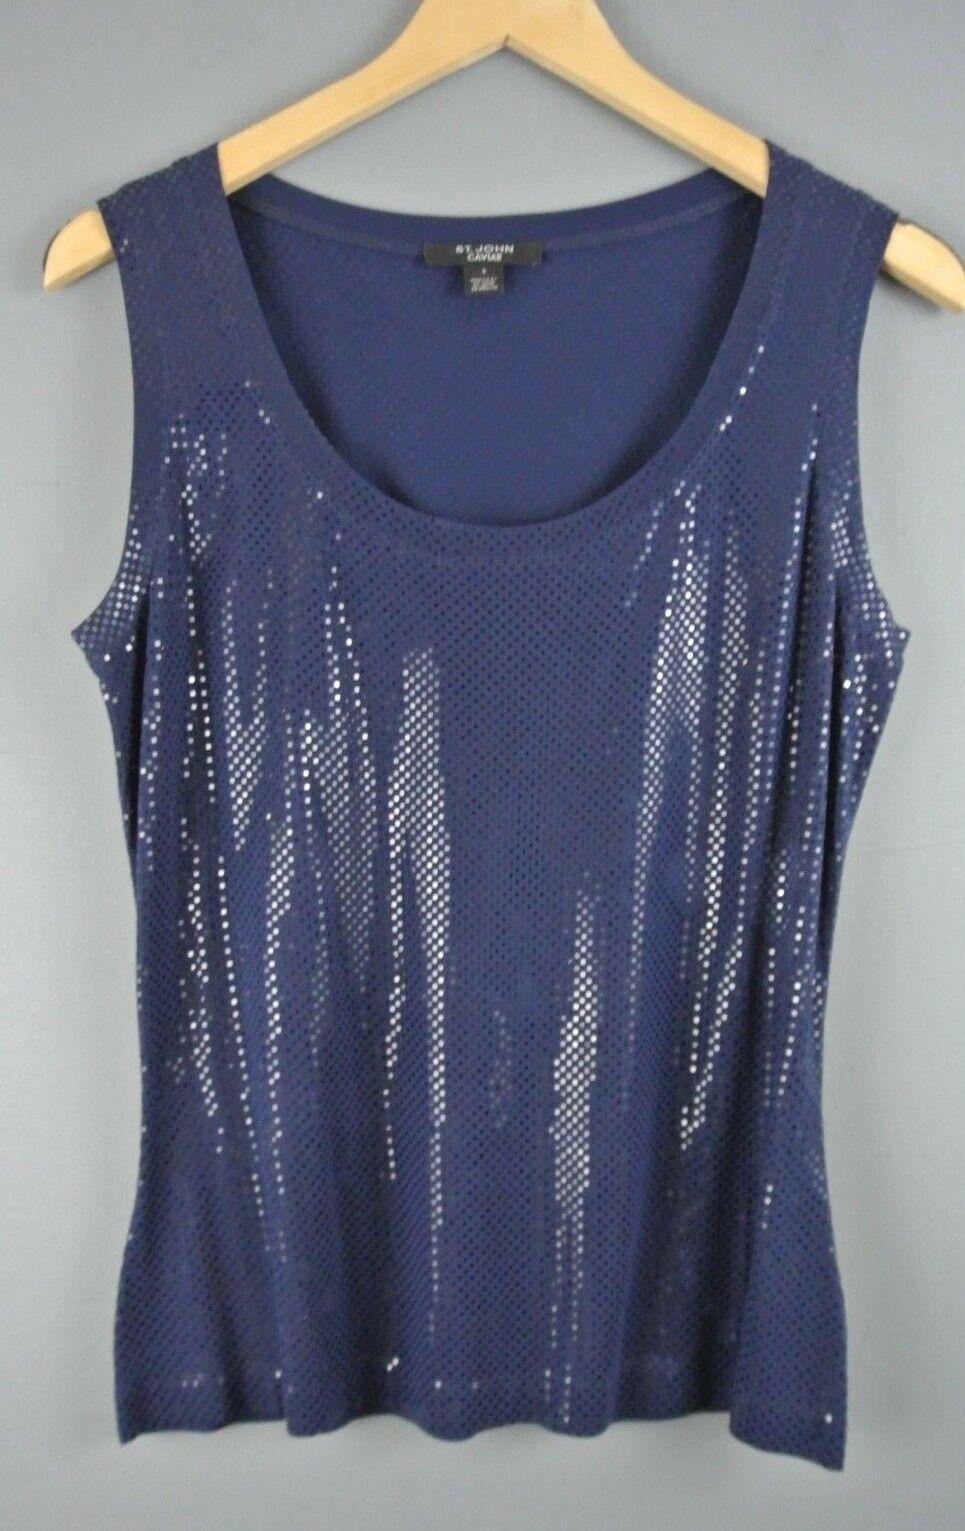 ST JOHN Navy Blau Tank Top Shimmer S Blouse T shirt Formal 1008 Caviar